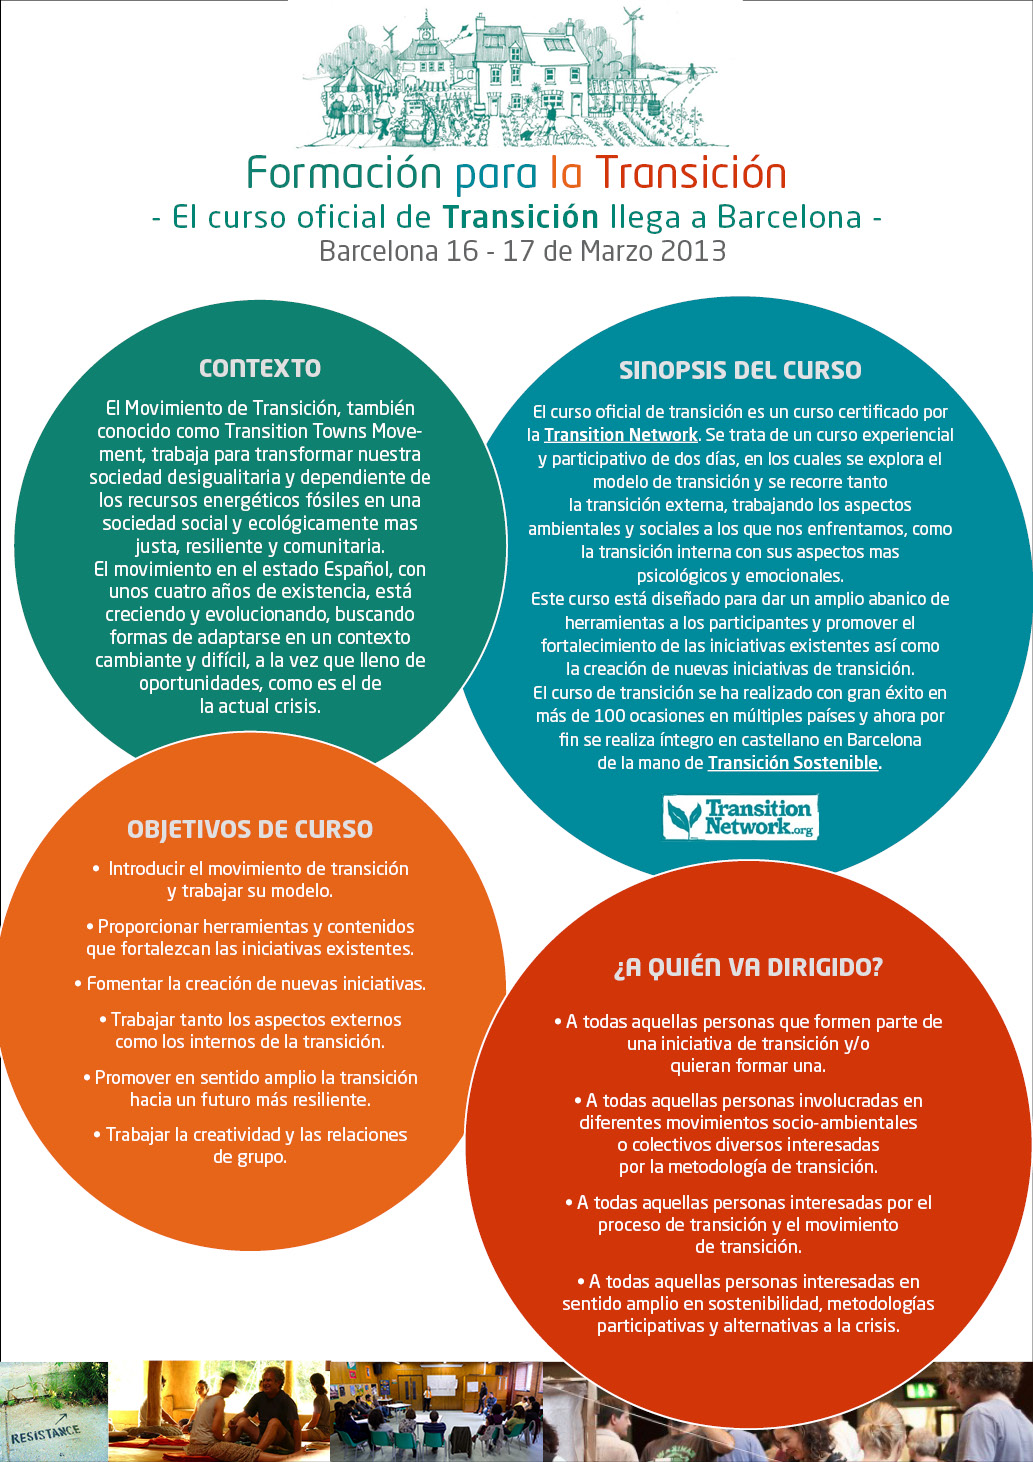 Curso oficial de Transición marzo 2013 Barcelona - Transición Sostenible